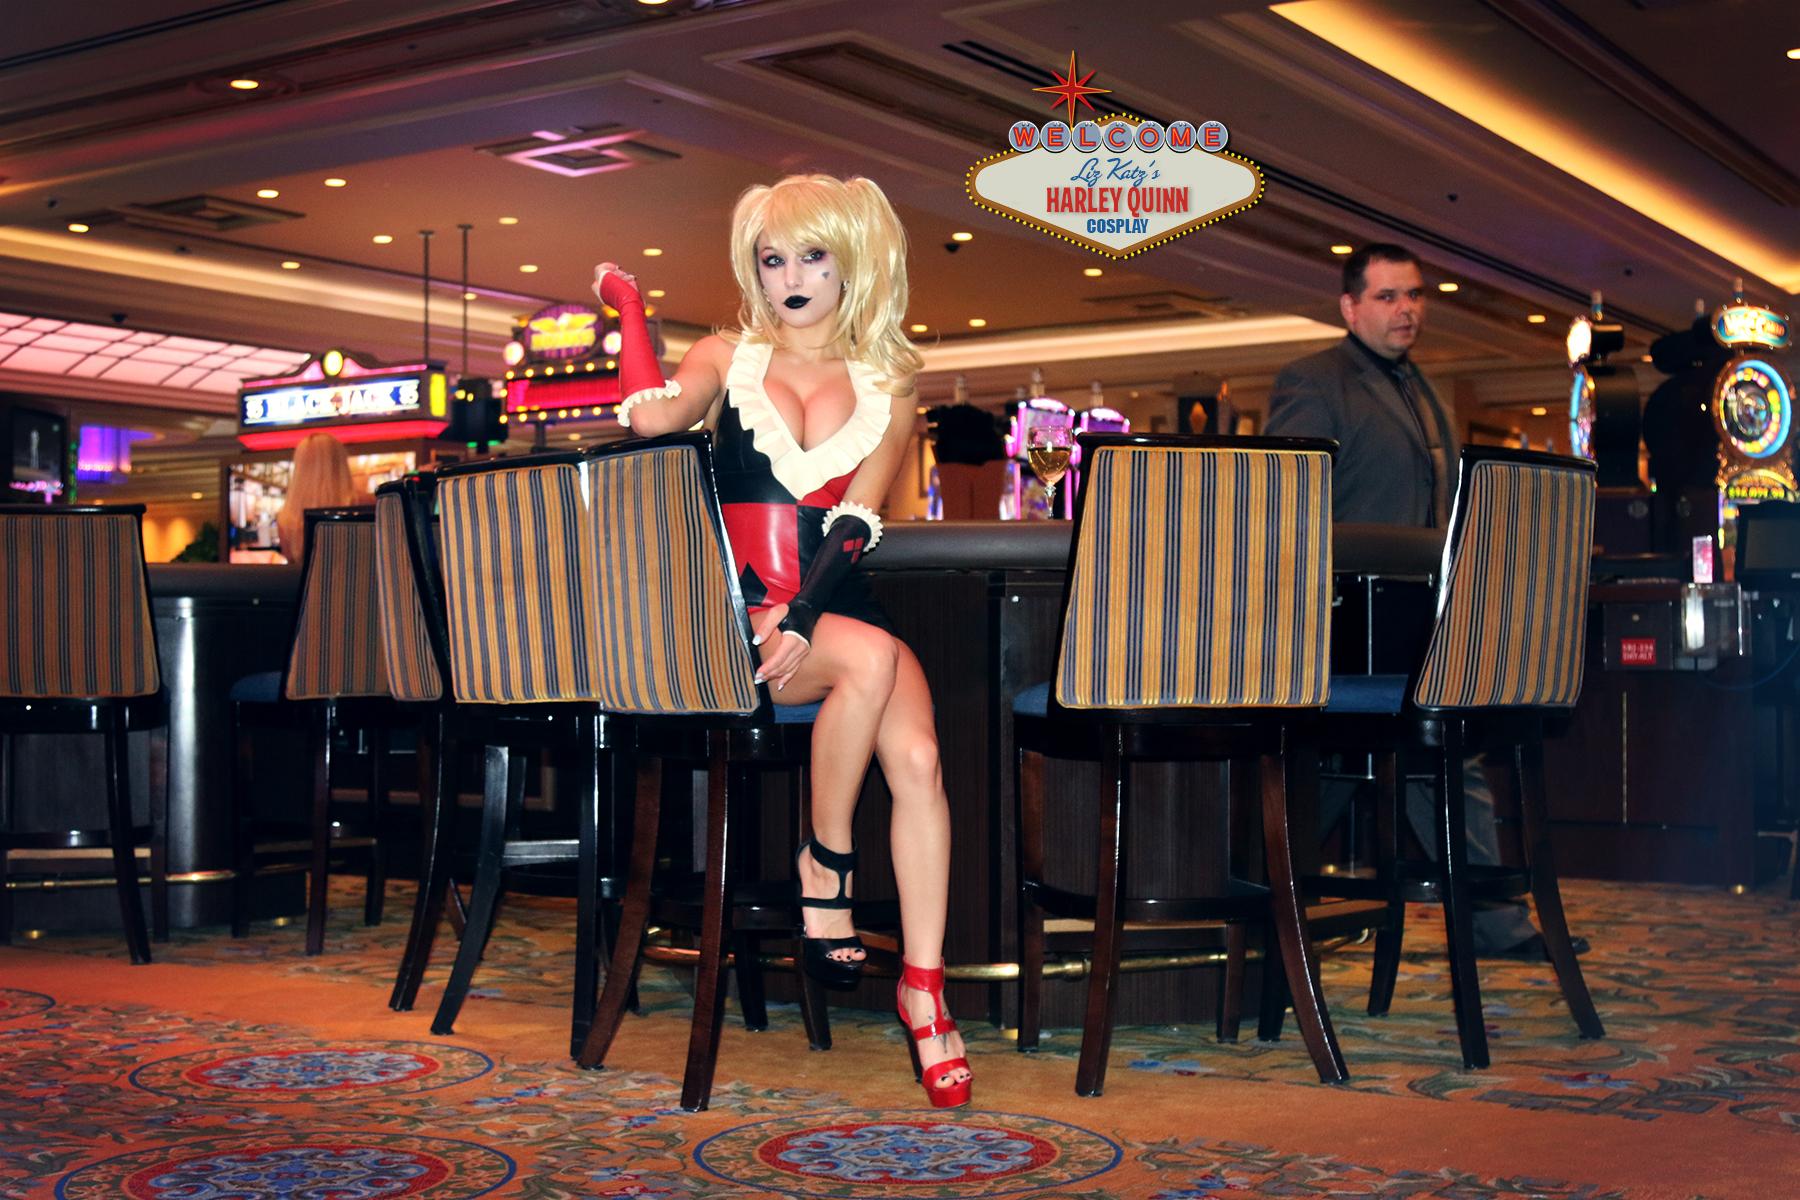 Harley Quinn Cosplay at her Vegas Casino by Liz Katz